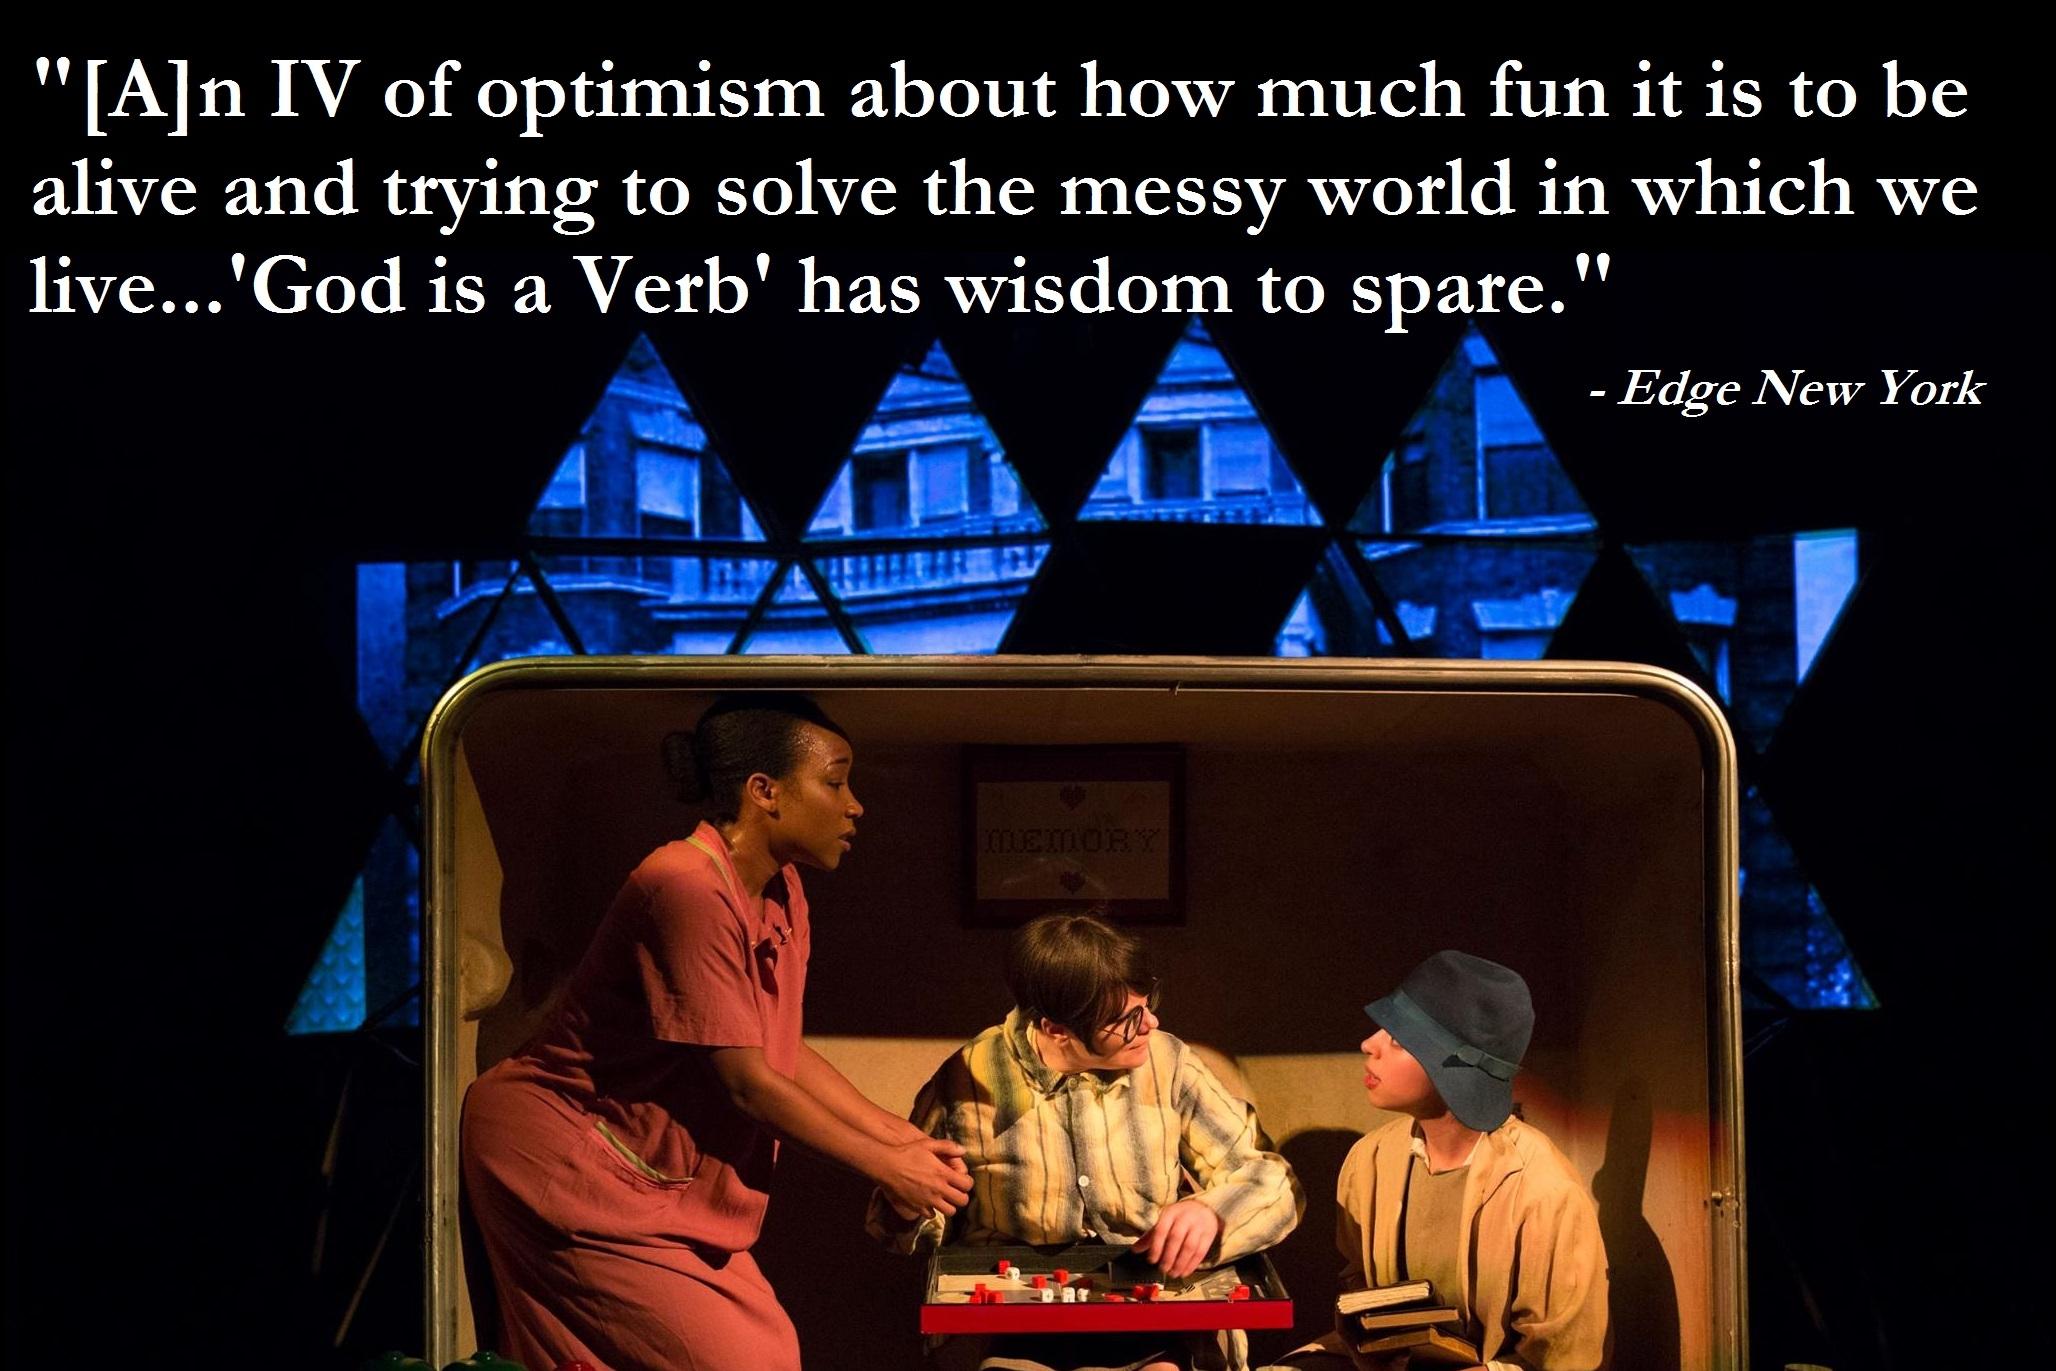 REVIEW: http://www.edgenewyork.com/entertainment/theatre/reviews//187175/theatre_review_::_god_is_a_verb